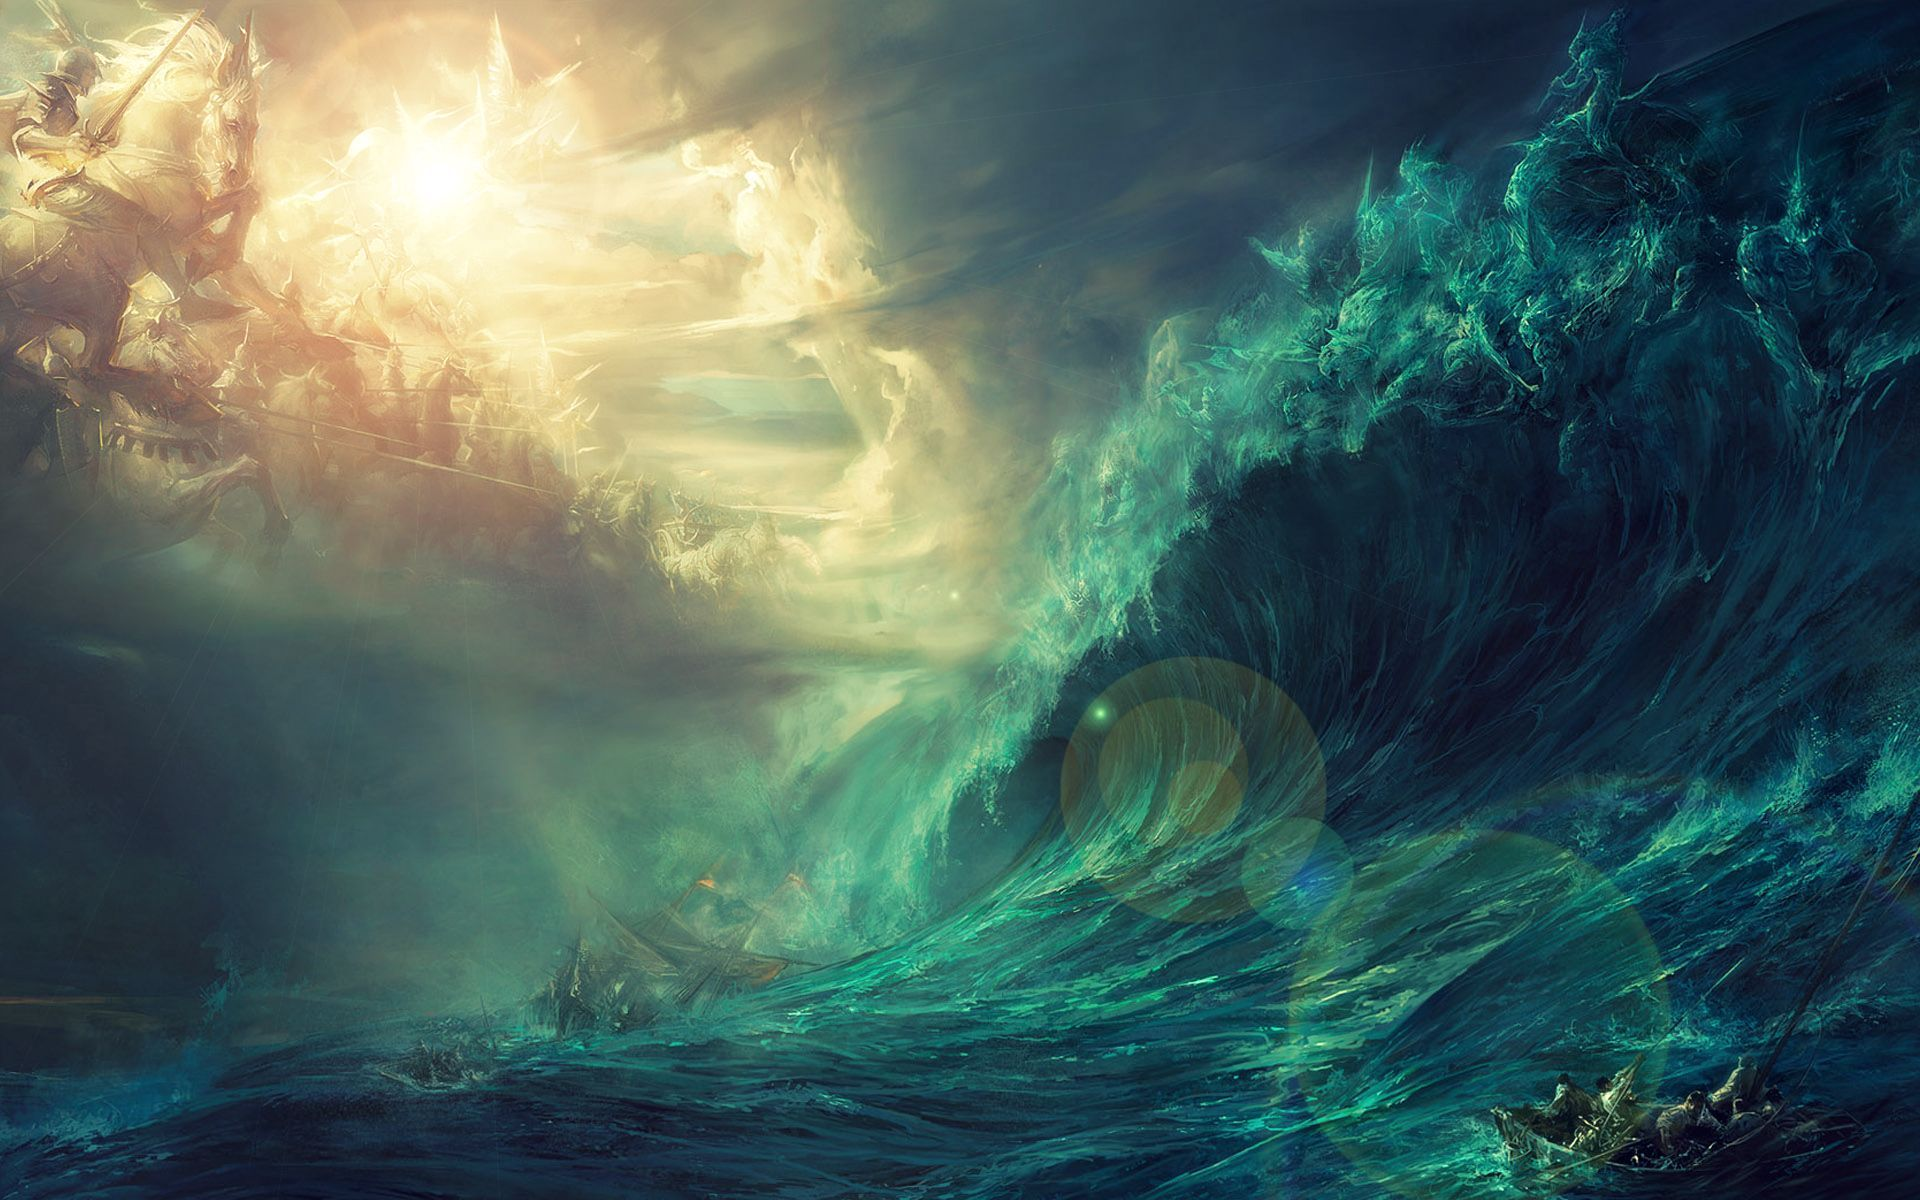 ✓ [FICHA] Mullet Ritter War-at-the-stormy-sea-fantasy-hd-wallpaper-1920x1200-1472